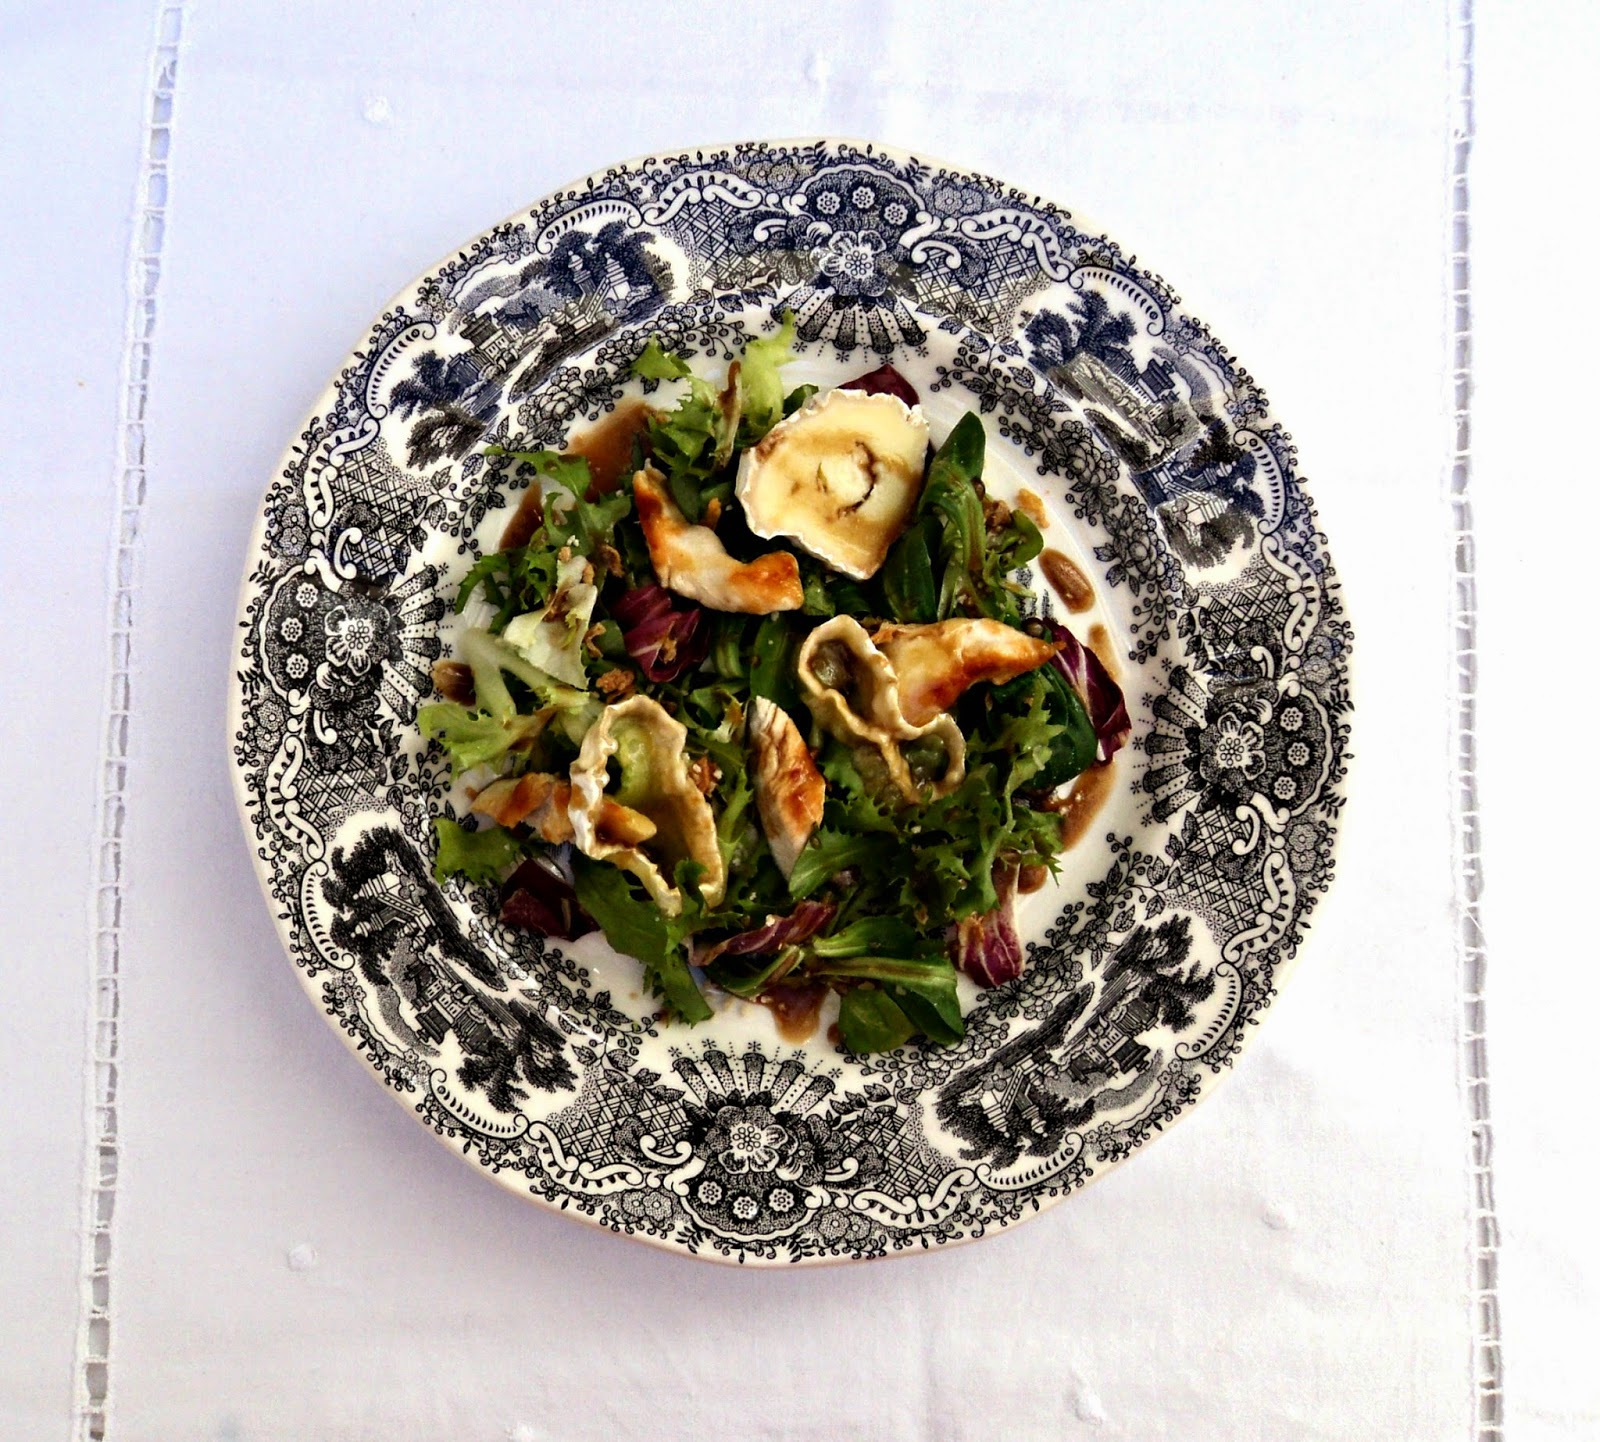 ensalada-brotes-pechuga-plato